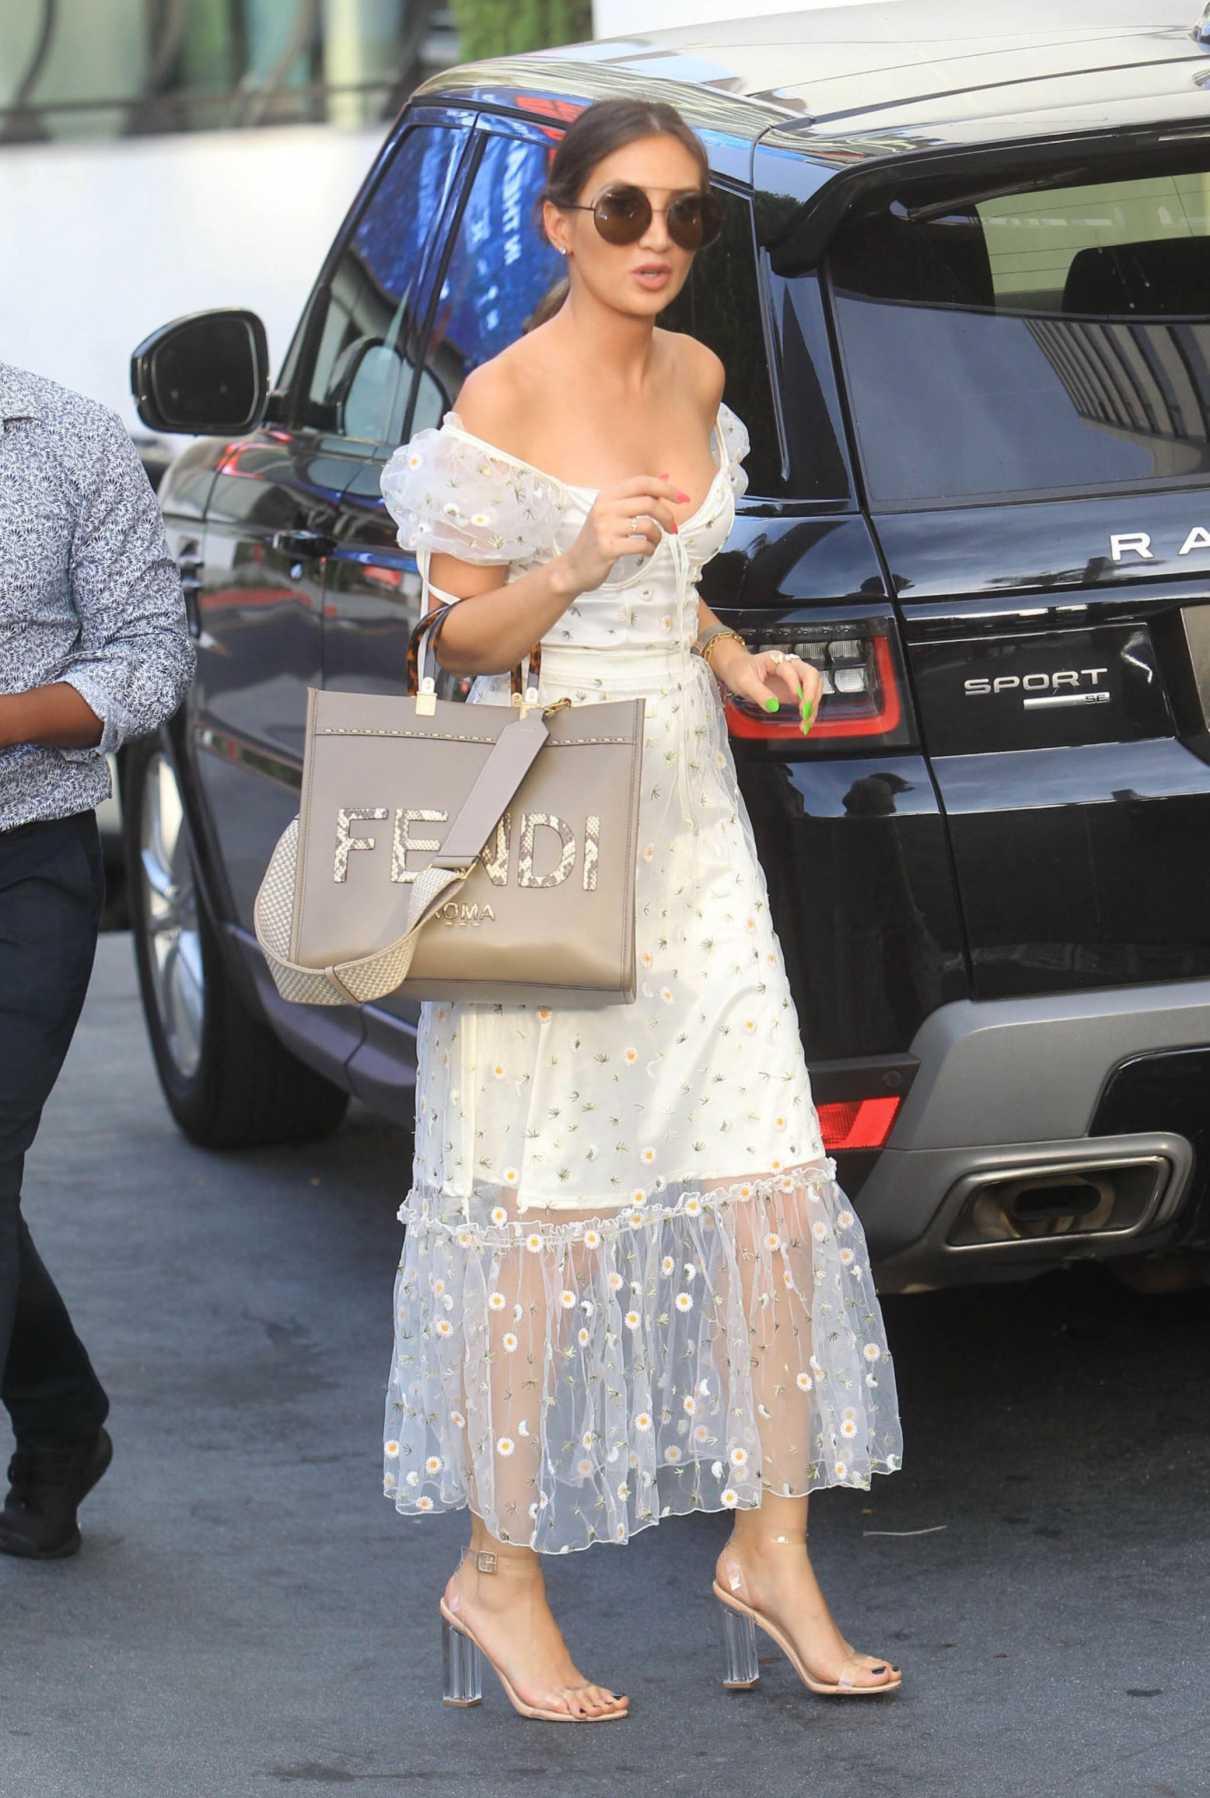 Megan Pormer in a White Floral Dress